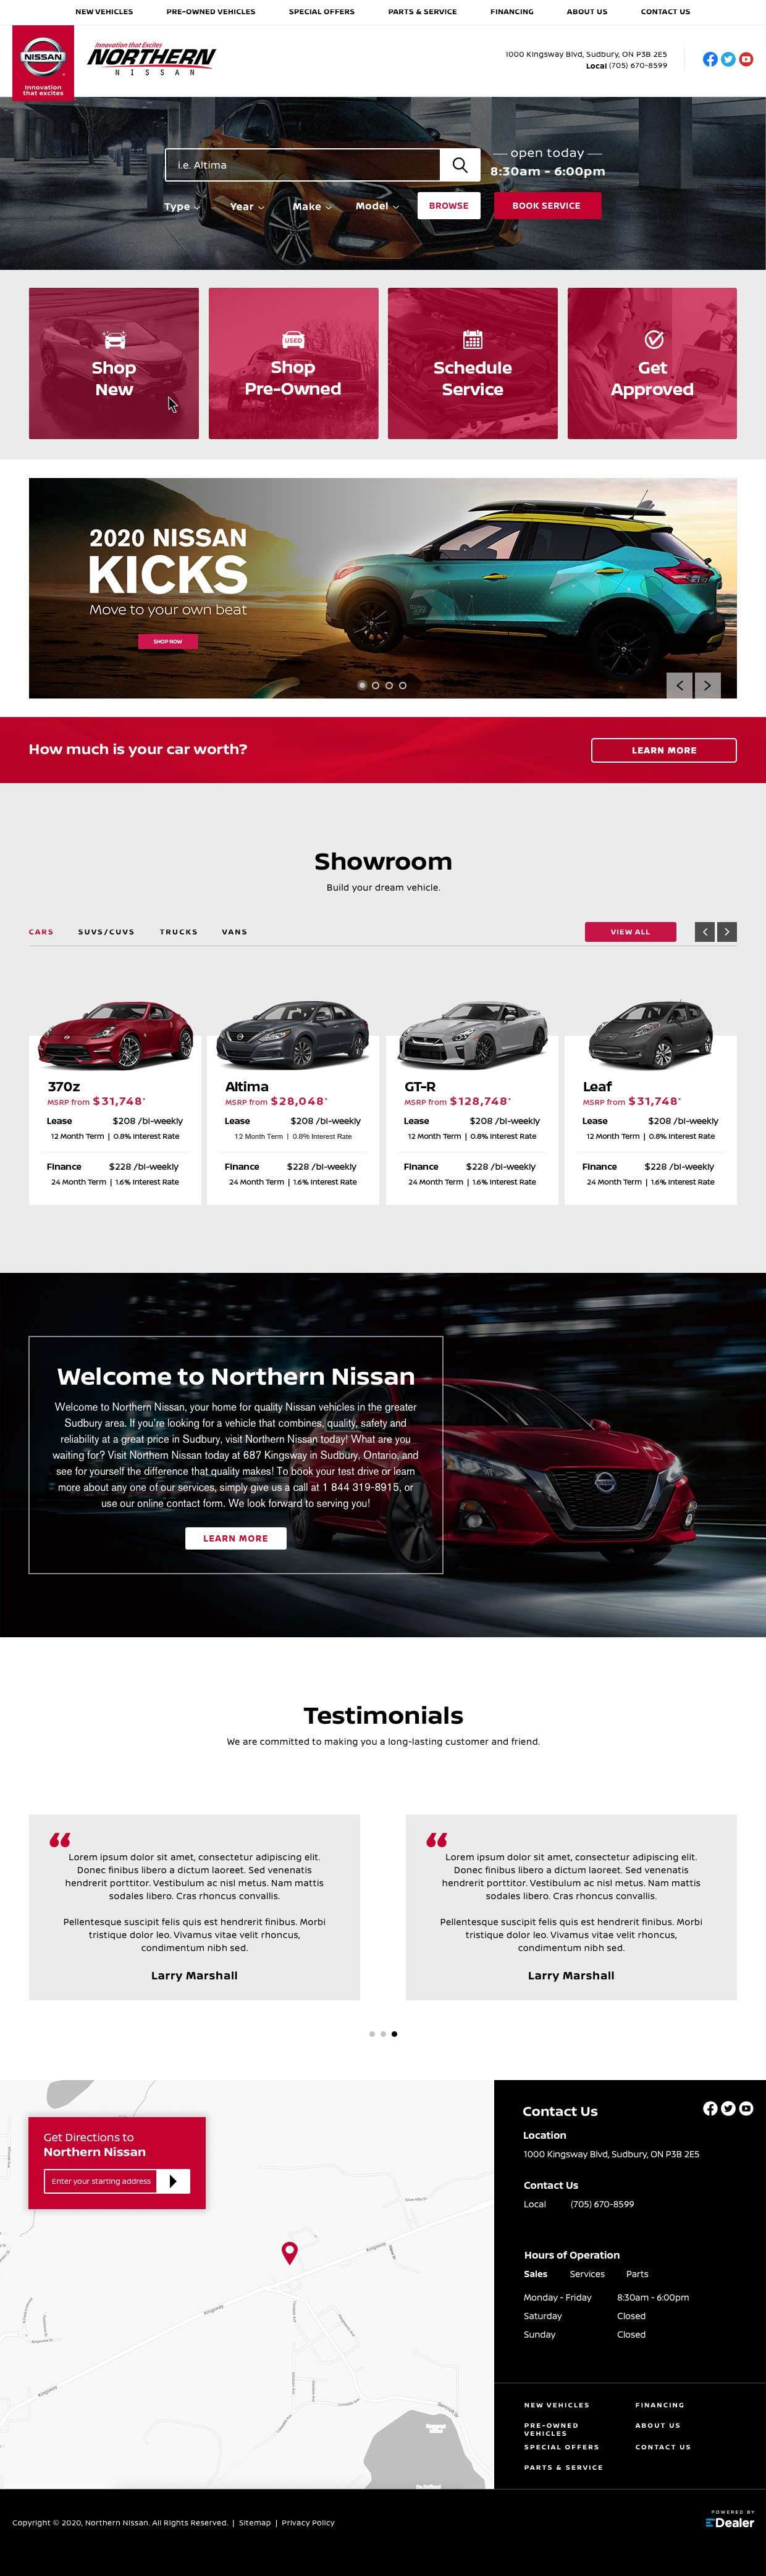 Northern Nissan